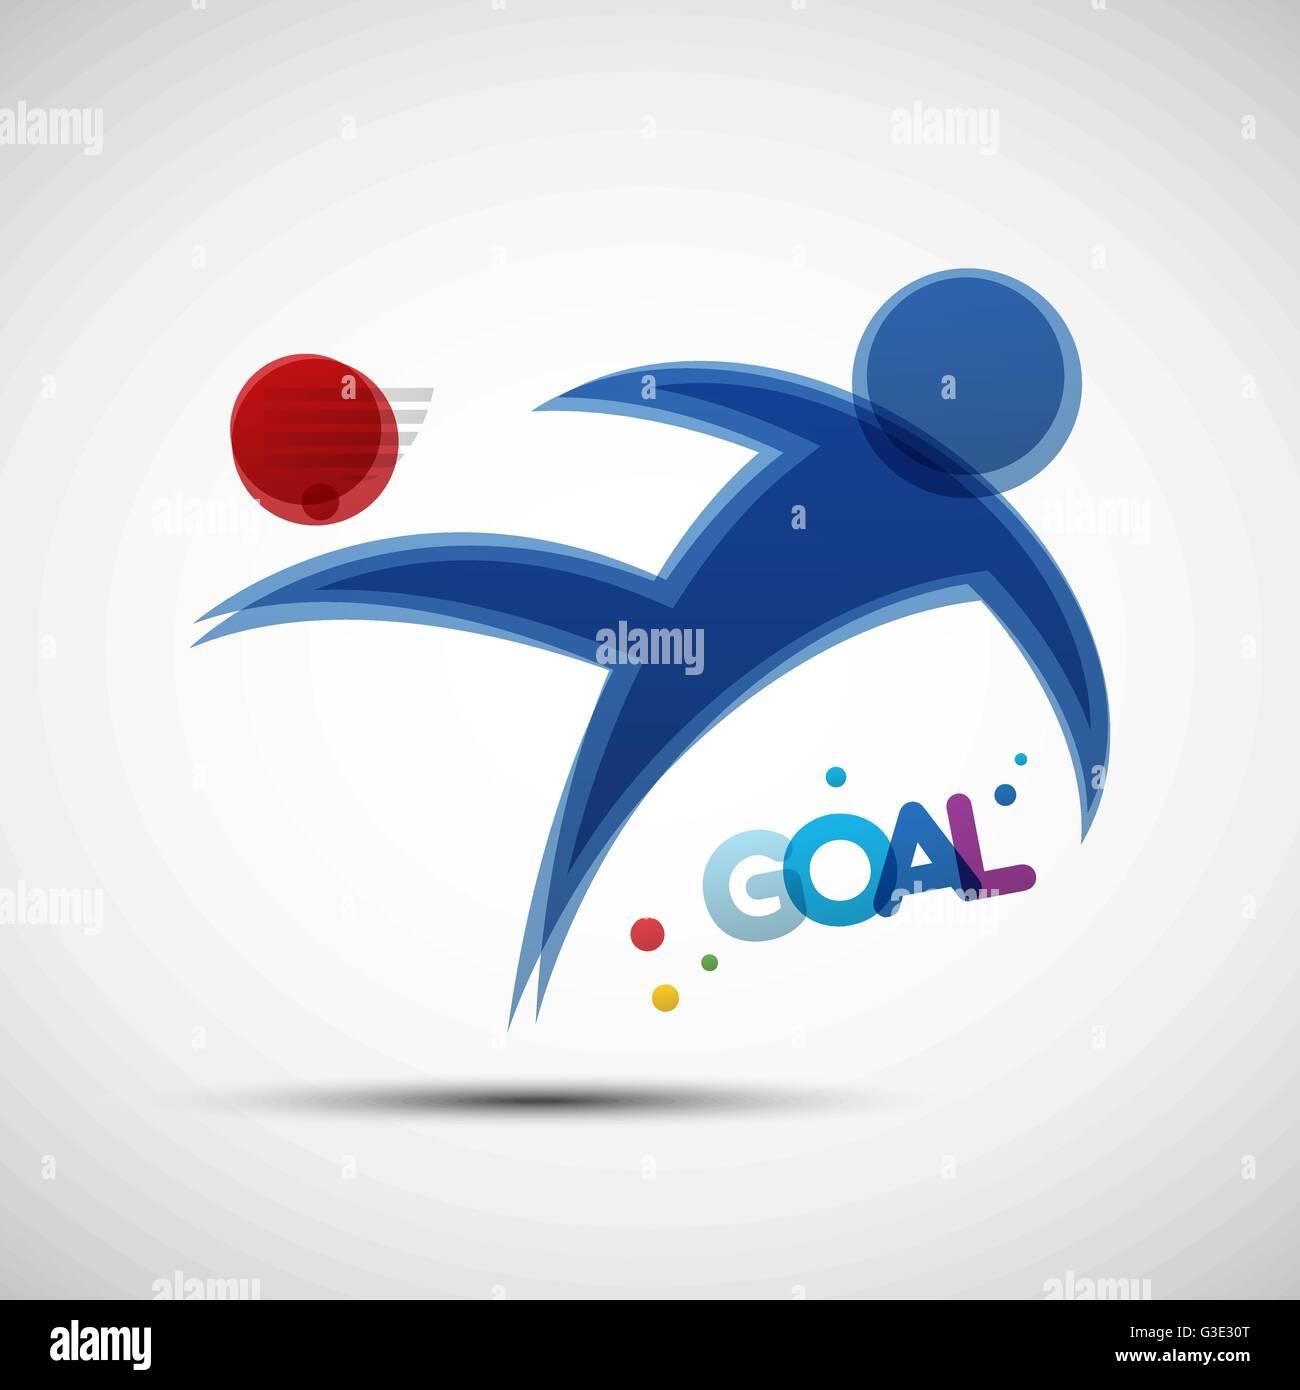 Football championship banner. Soccer player kicks the ball. Vector illustration of abstract footballer silhouette - Stock Vector